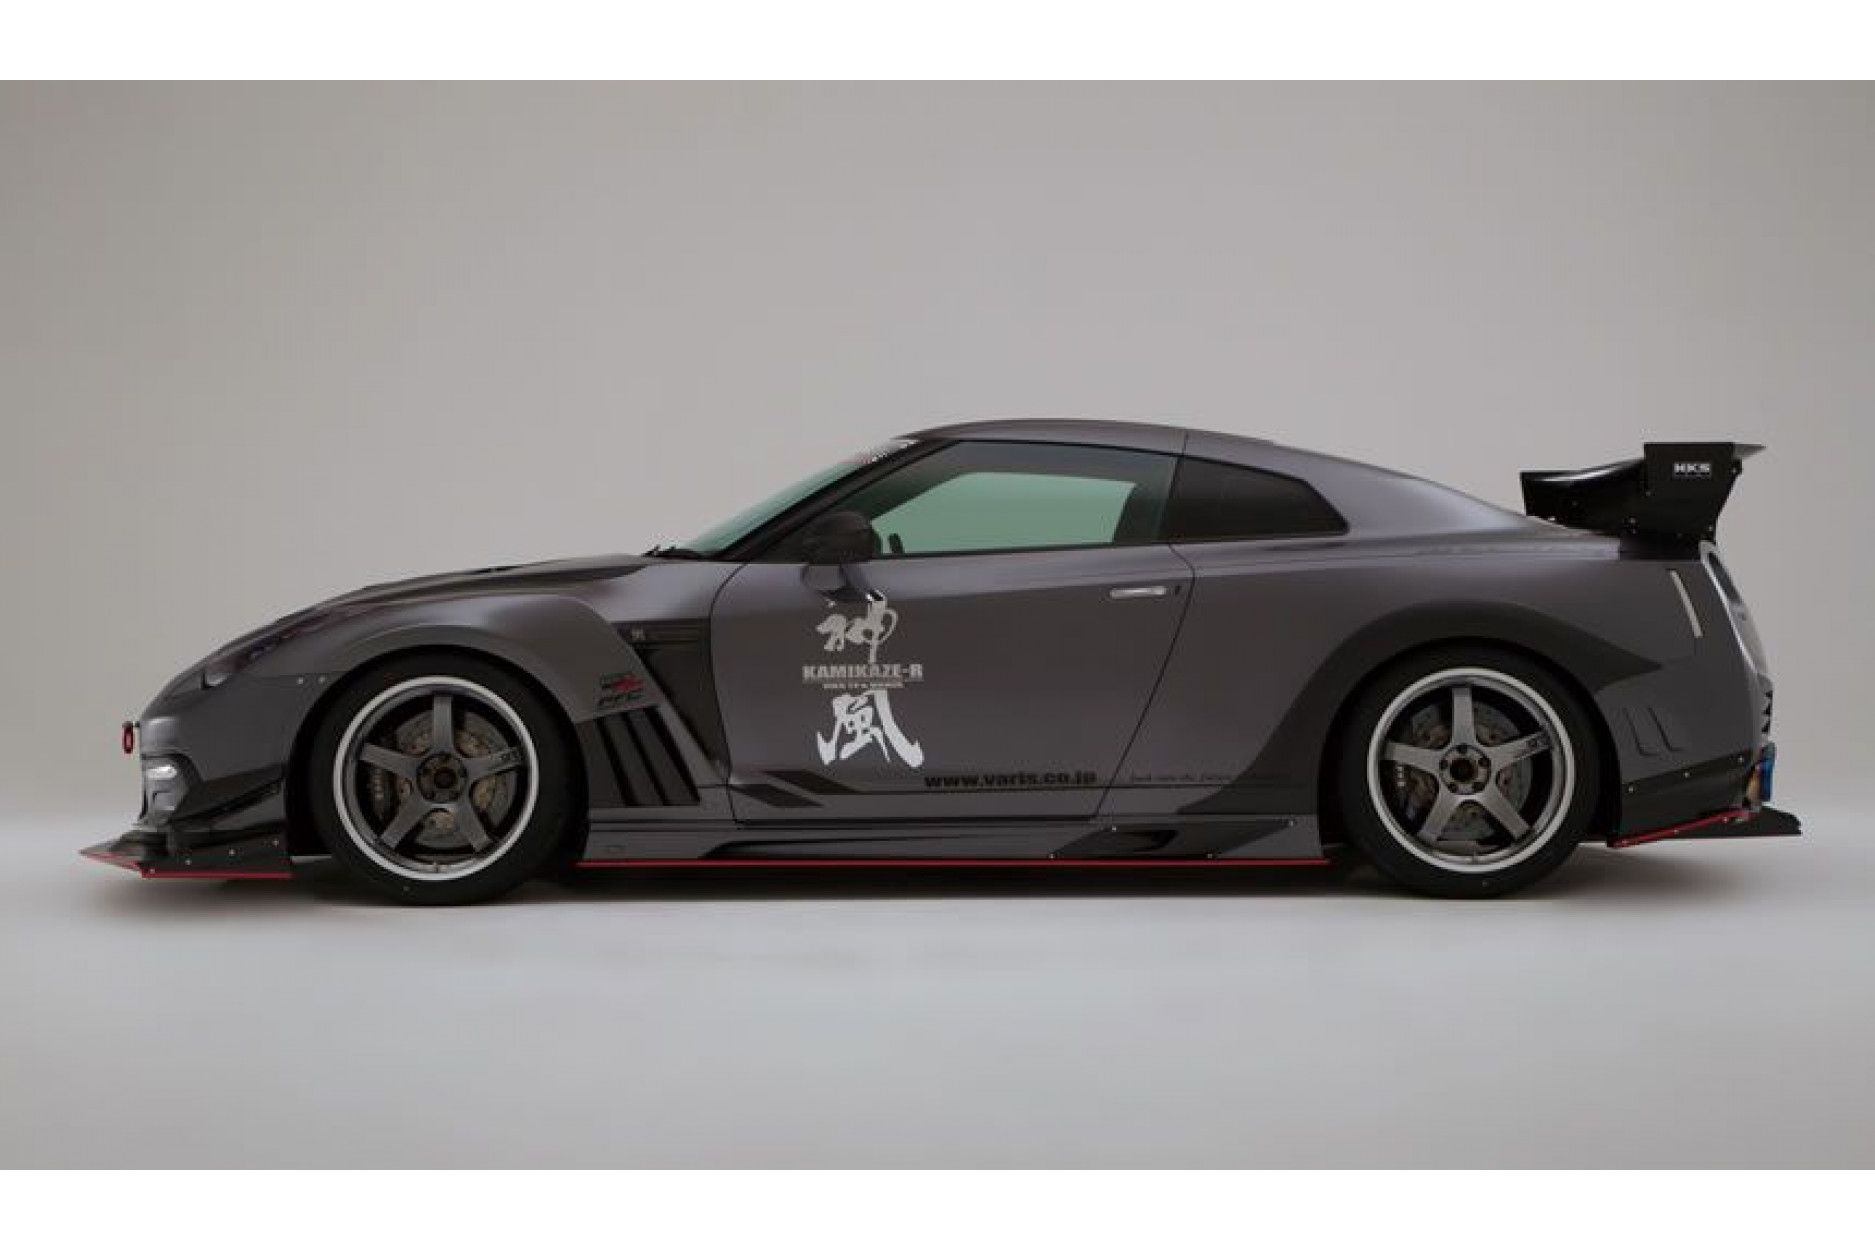 Varis Heck Kotflügel Kamikaze für Nissan R35 GT-R (Carbon)